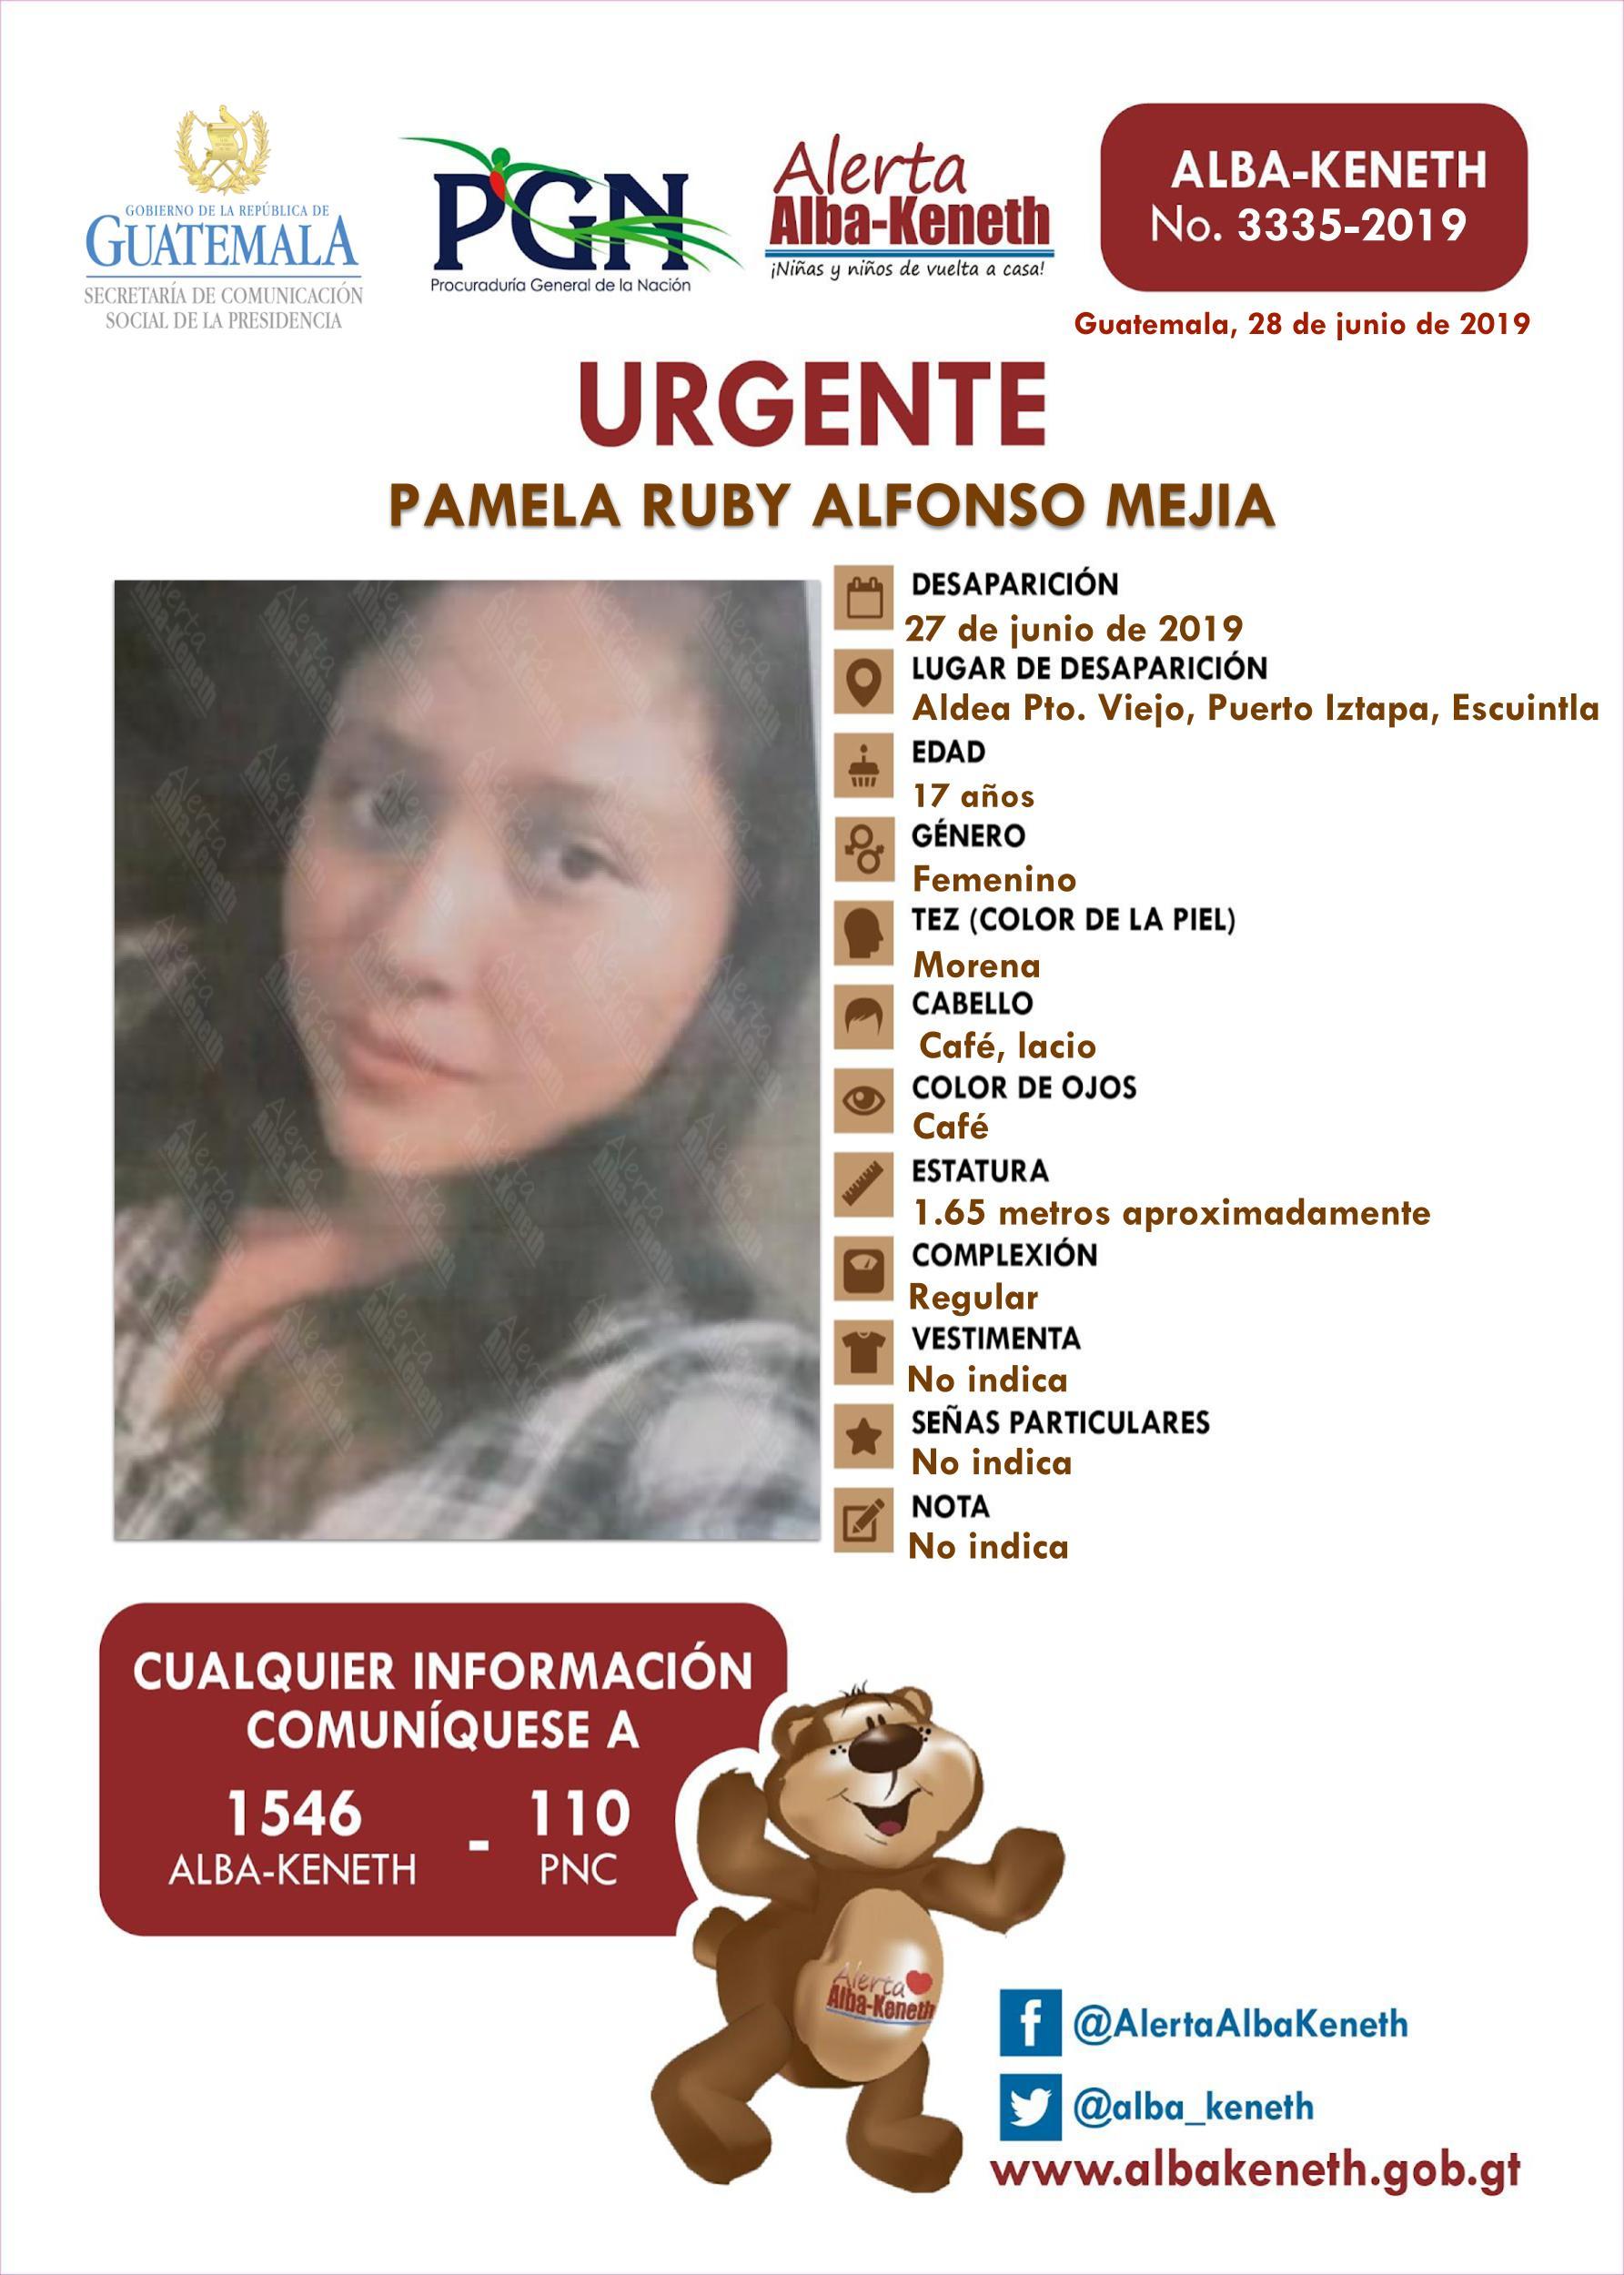 Pamela Ruby Alfonso Mejia